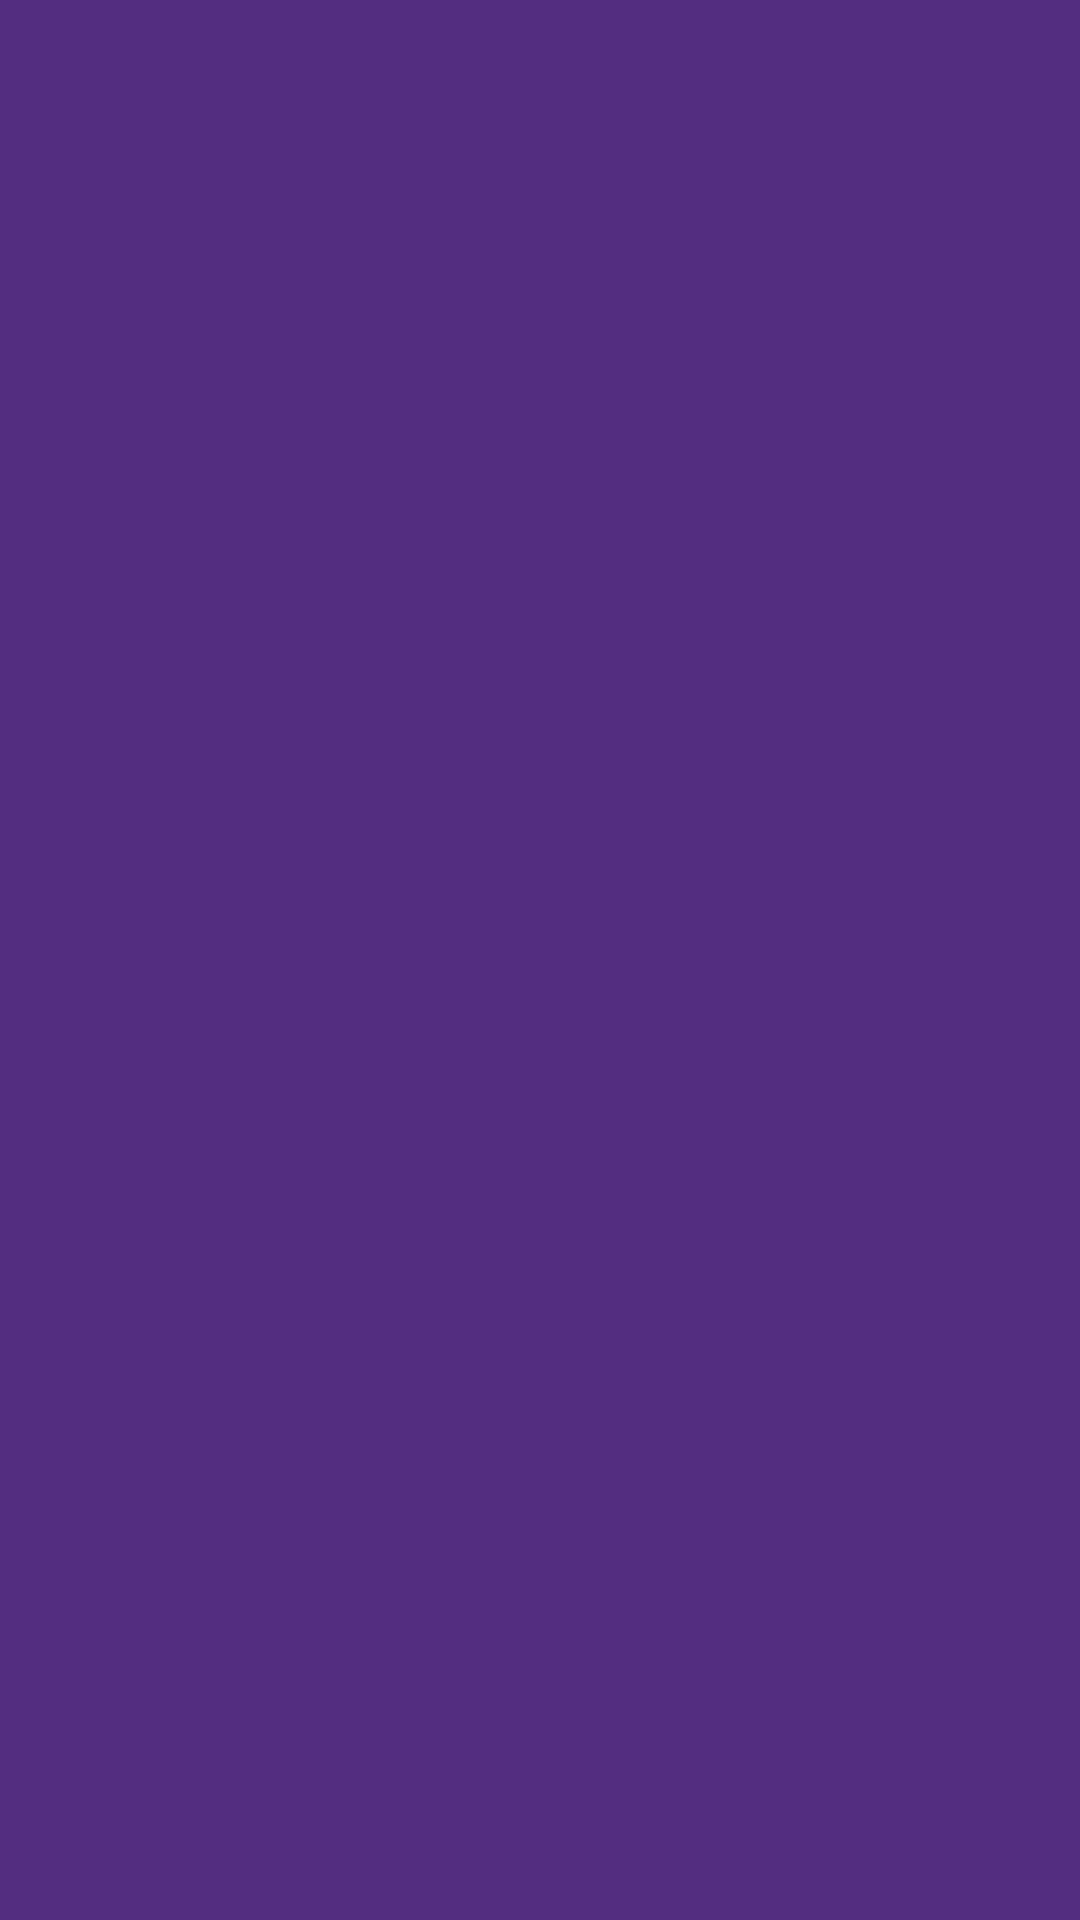 1080x1920 Regalia Solid Color Background